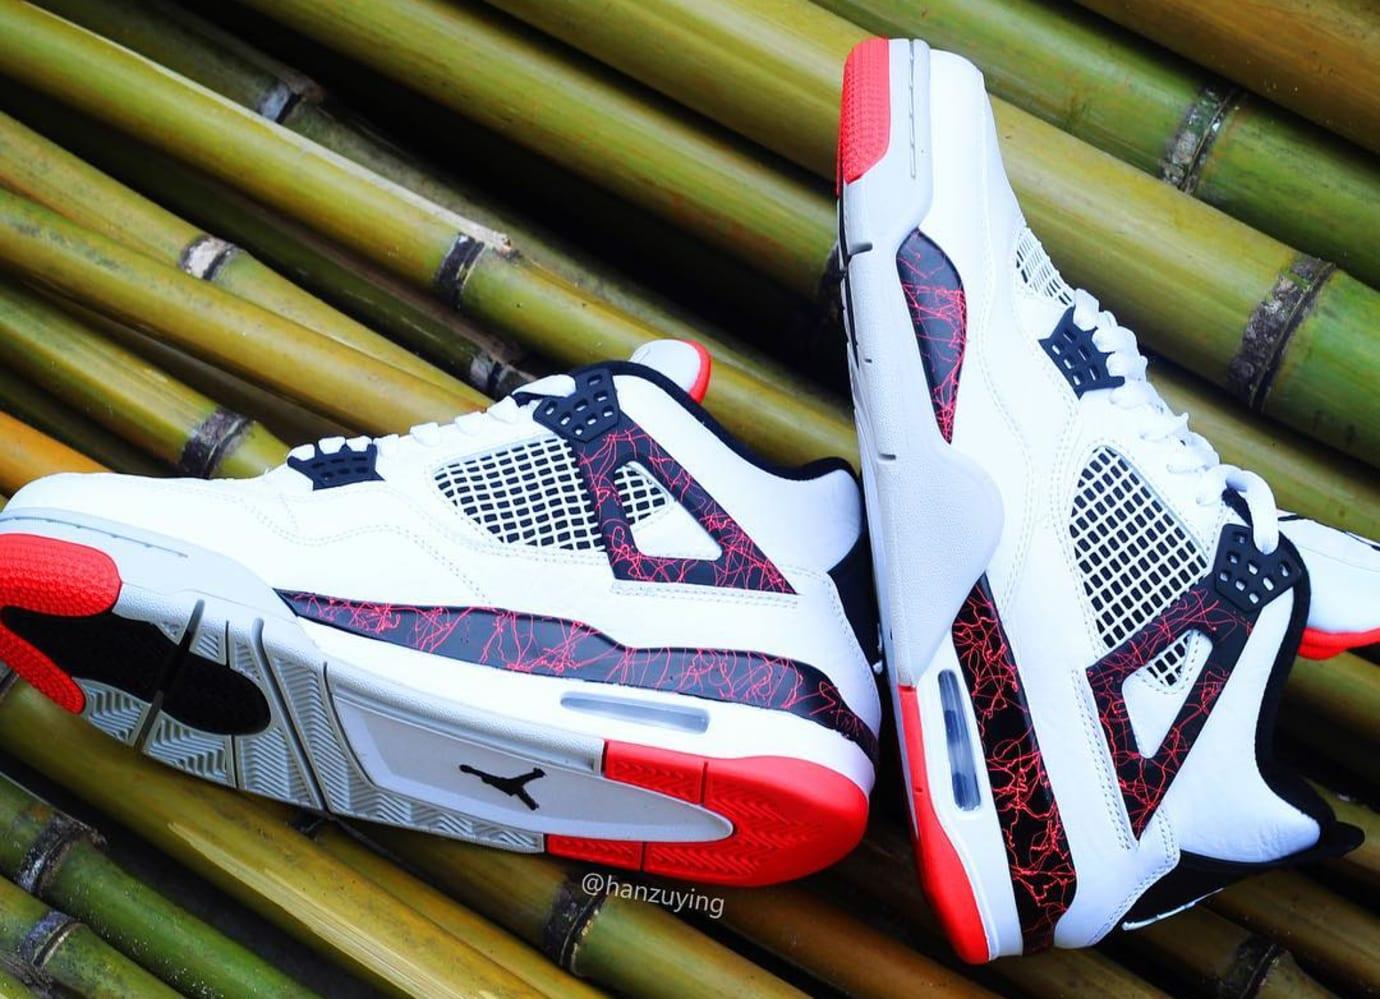 38a017425a8 Image via  hanzuying · Air Jordan 4 Retro  White Black-Light Crimson-Pale  Citron  308497